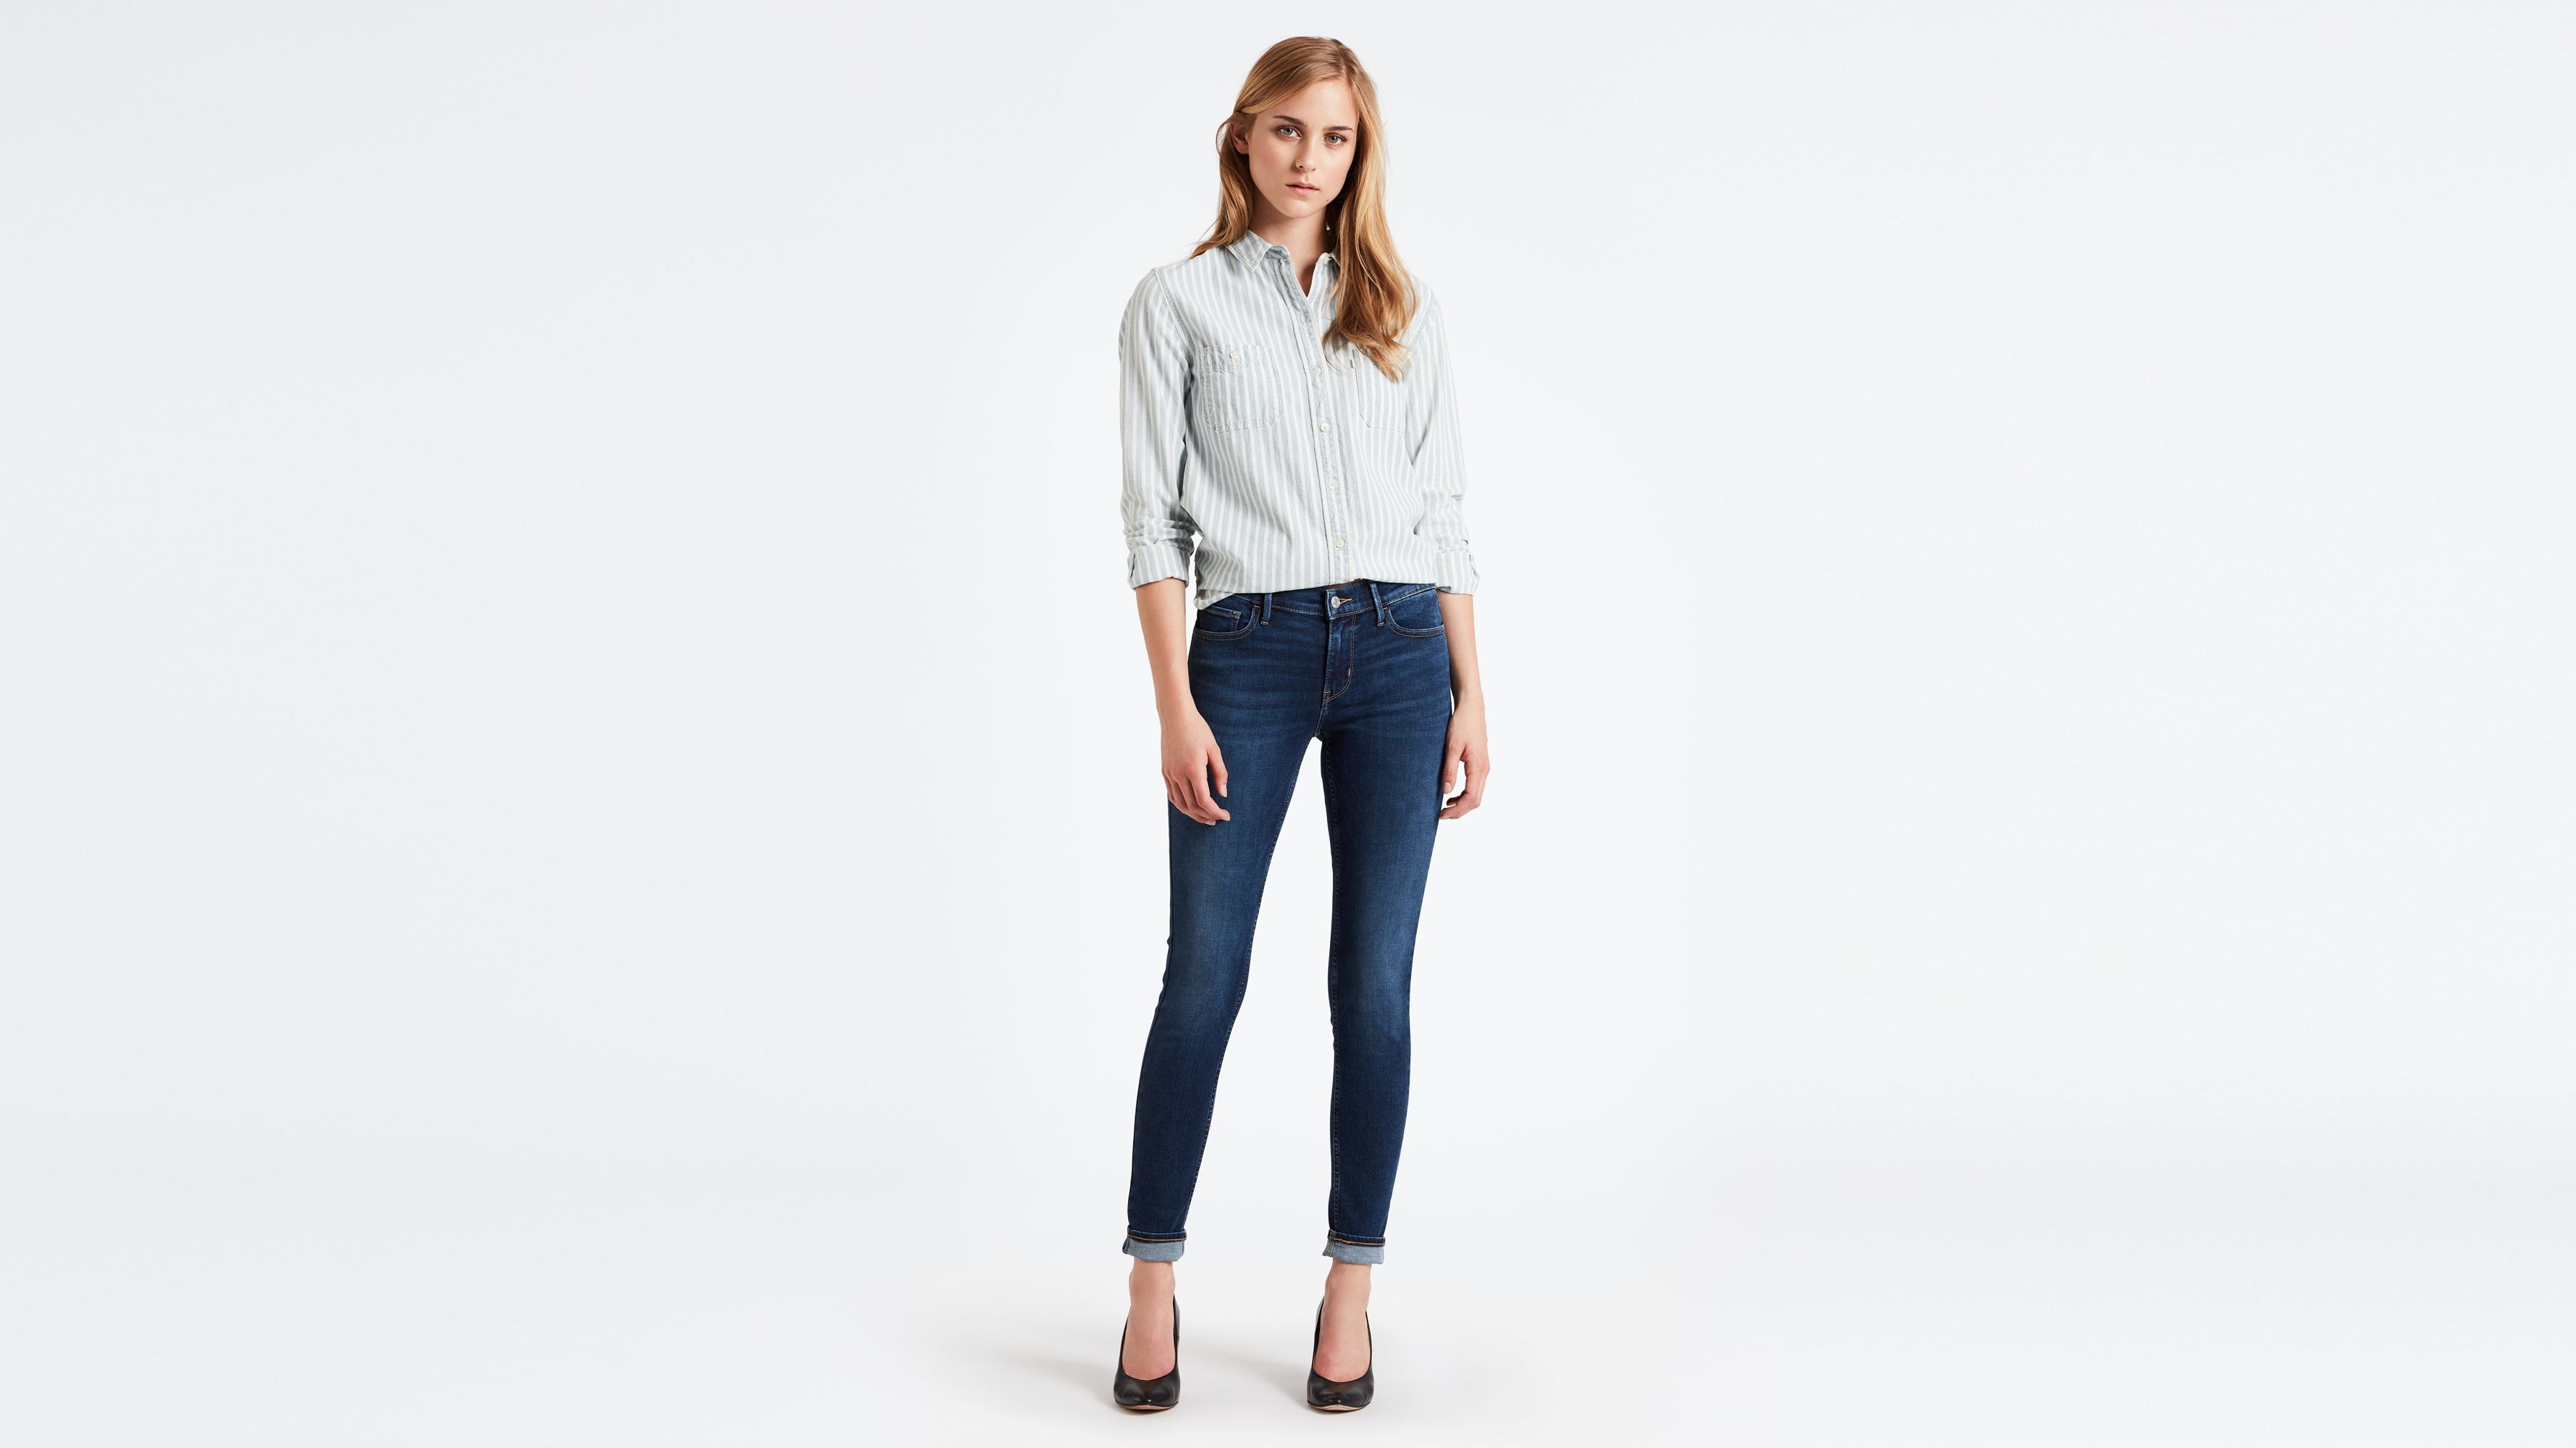 710™ Innovation Super Skinny Jeans